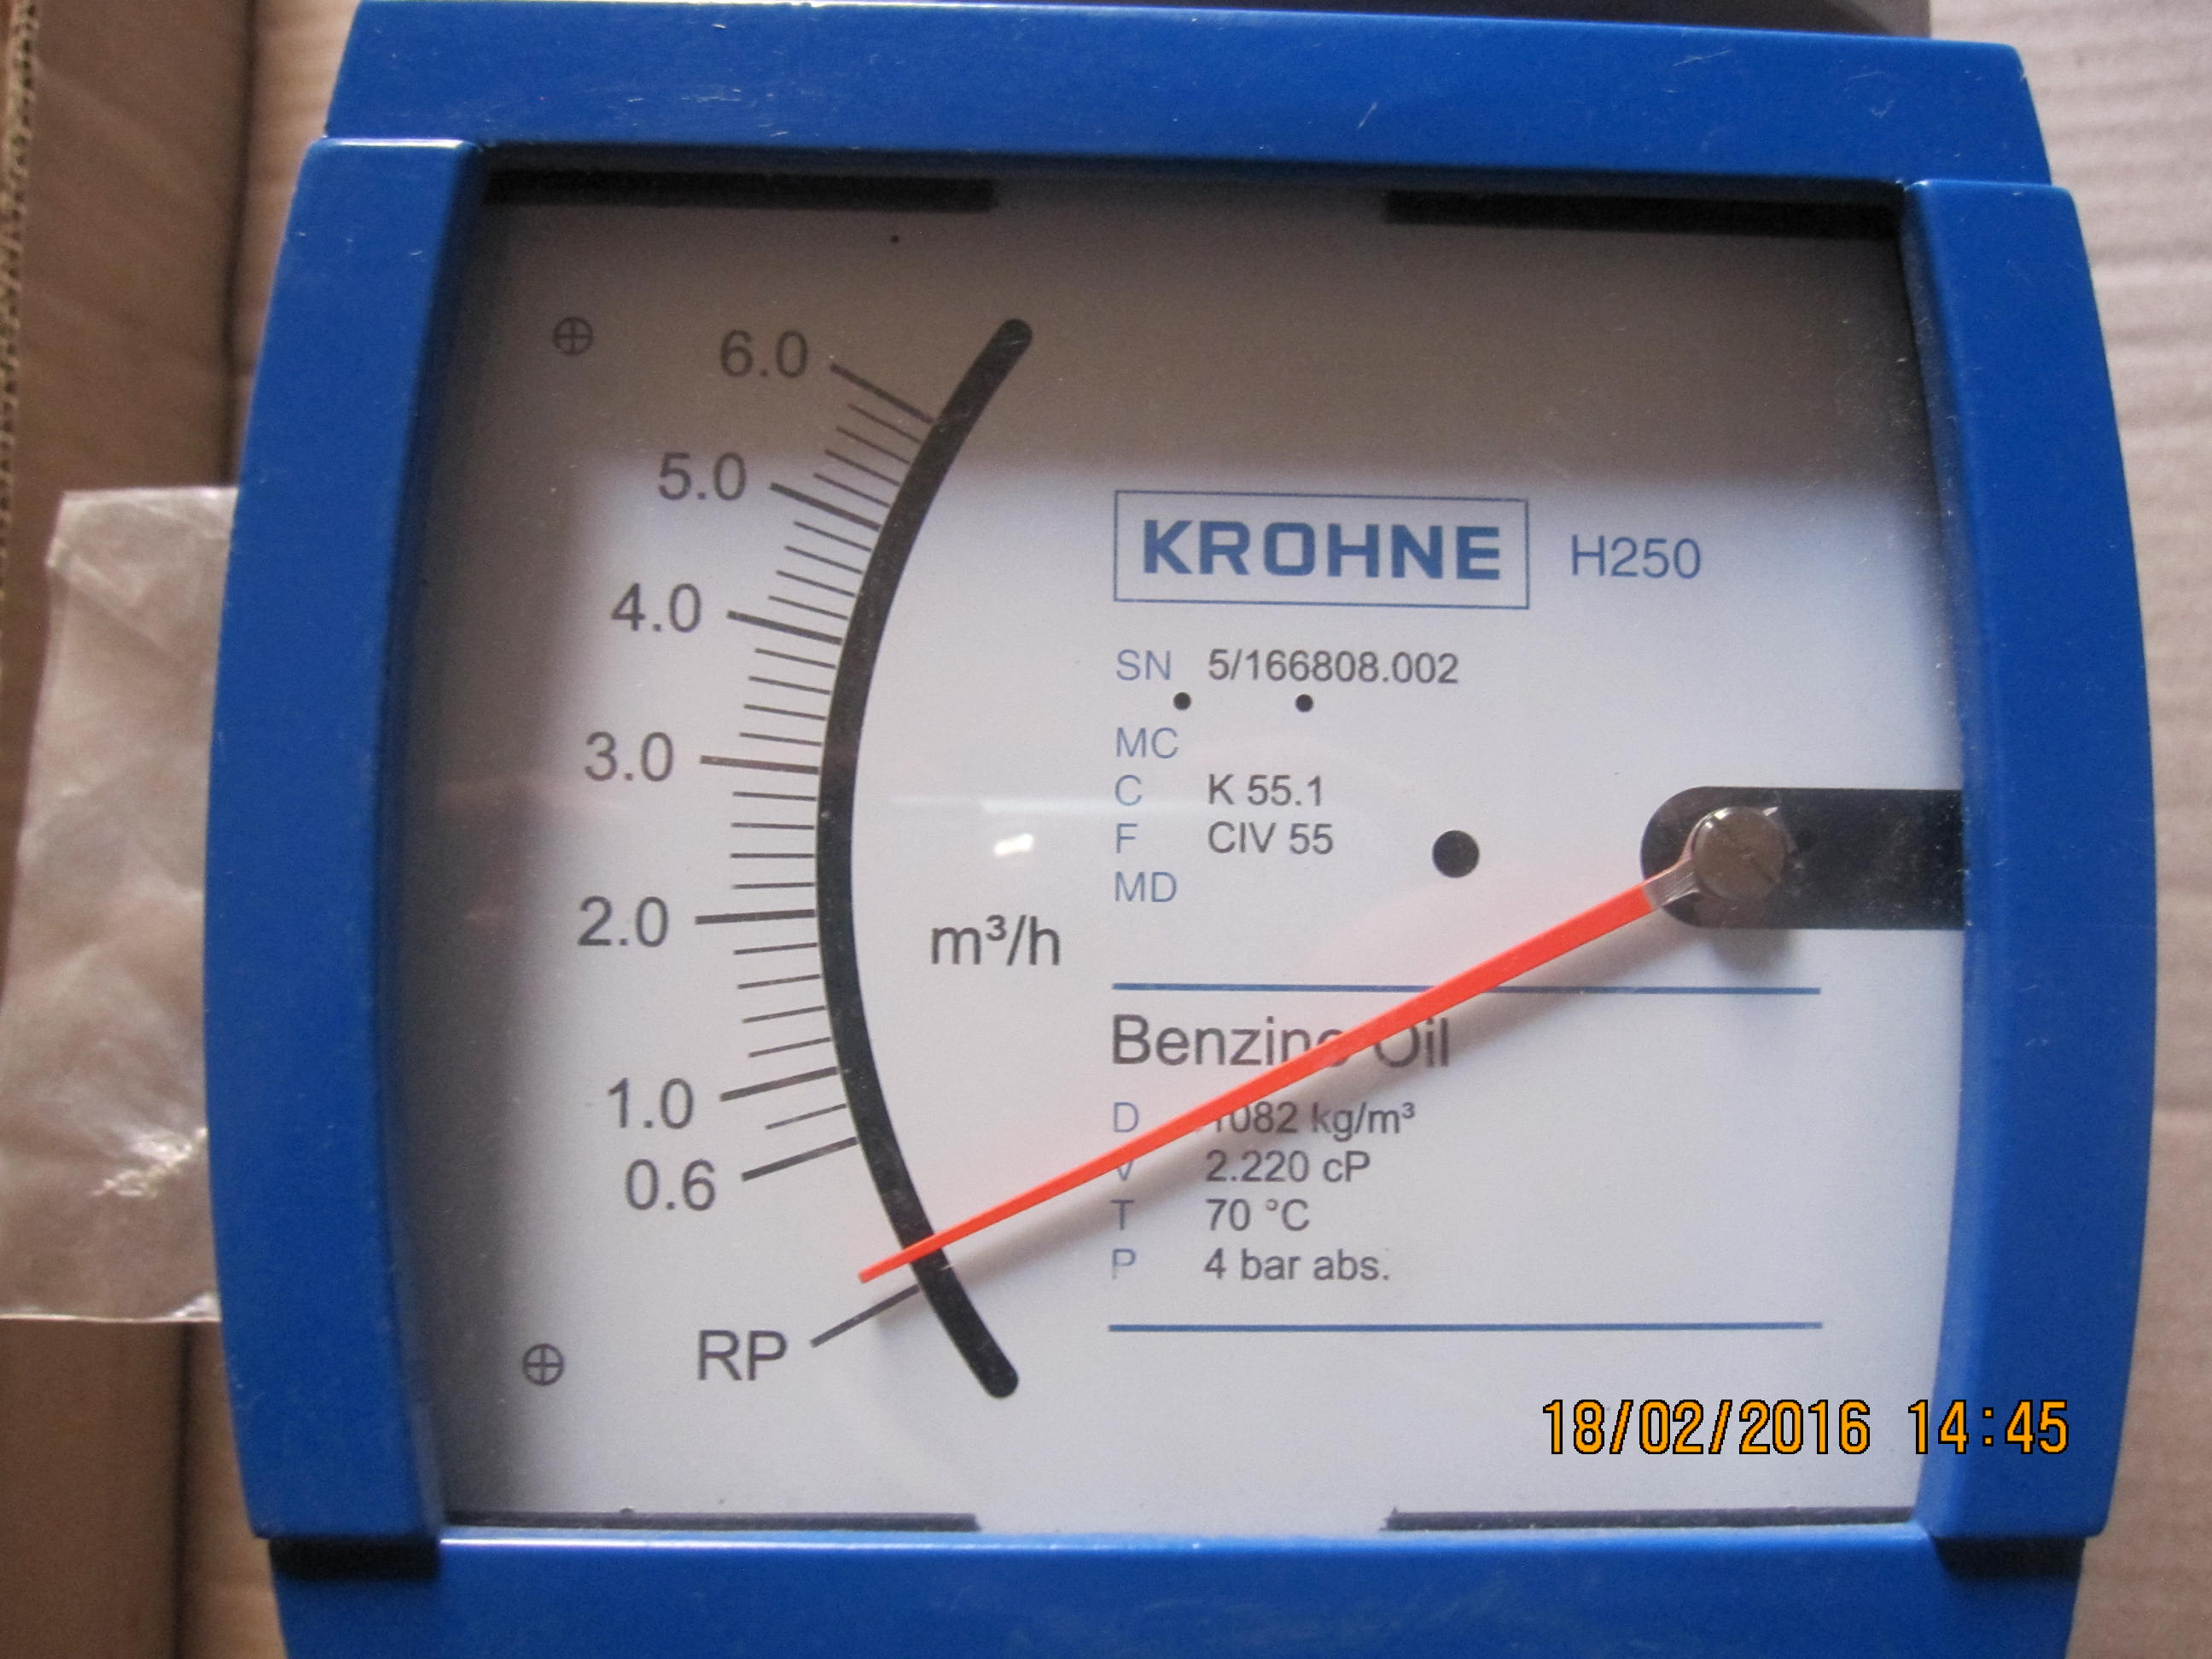 Расходомер Krohne H250 RR M9 ESK-EEx d-50, d-80, зображення 1